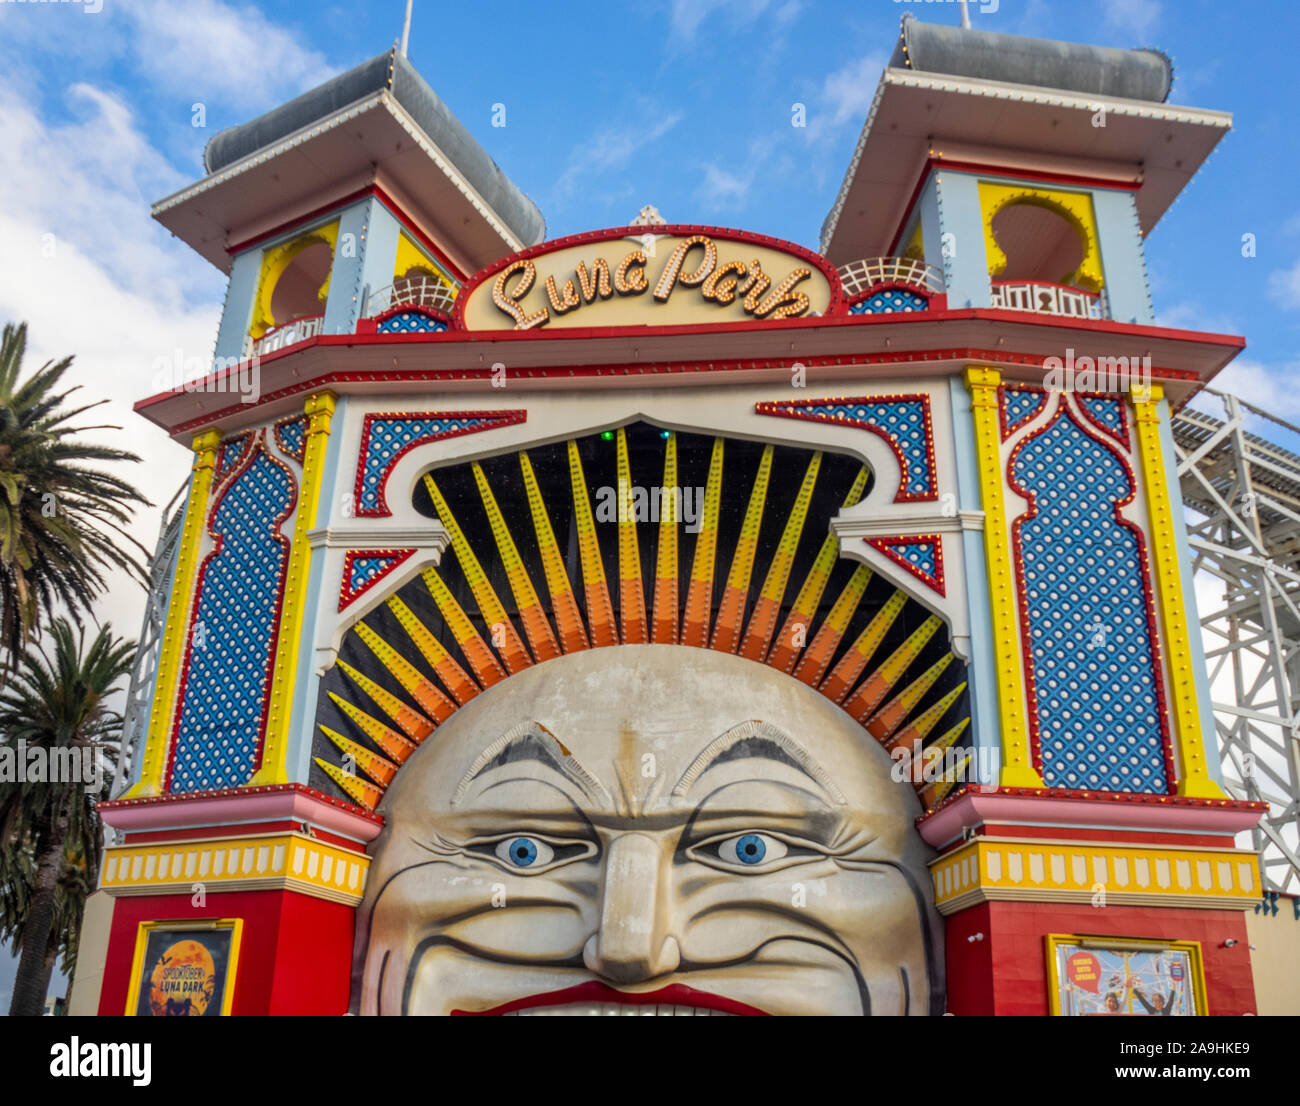 Iconic Mr Moon Face entrance to Luna Park amusement park fairground in St Kilda Melbourne Victoria Australia. Stock Photo